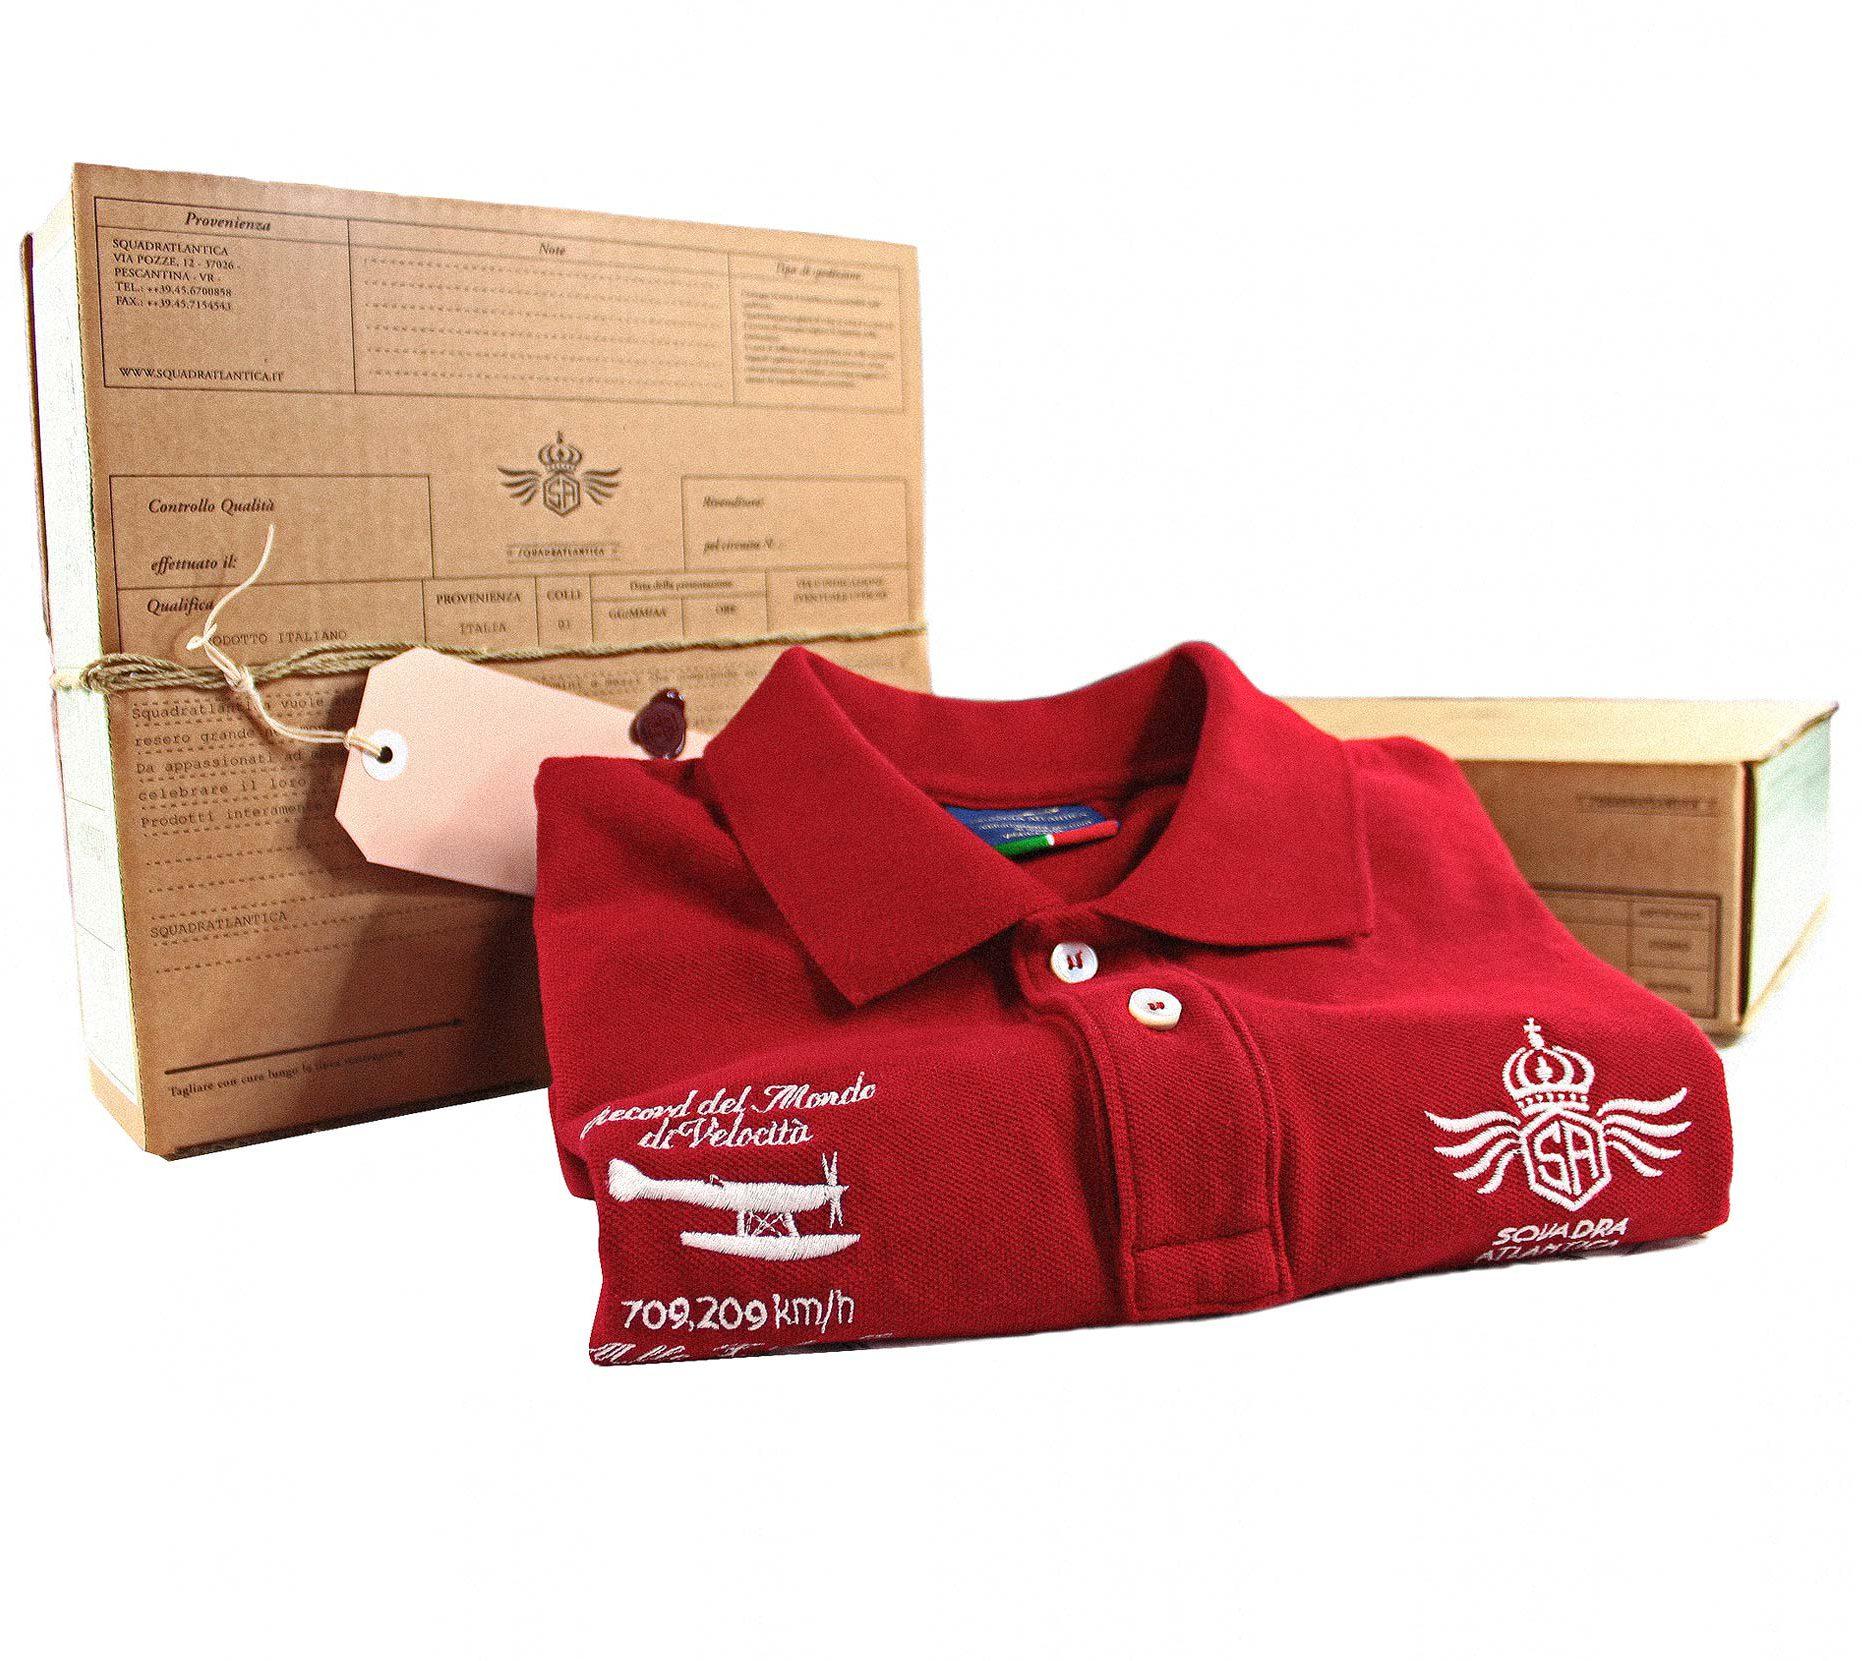 squadratlatnica packaging